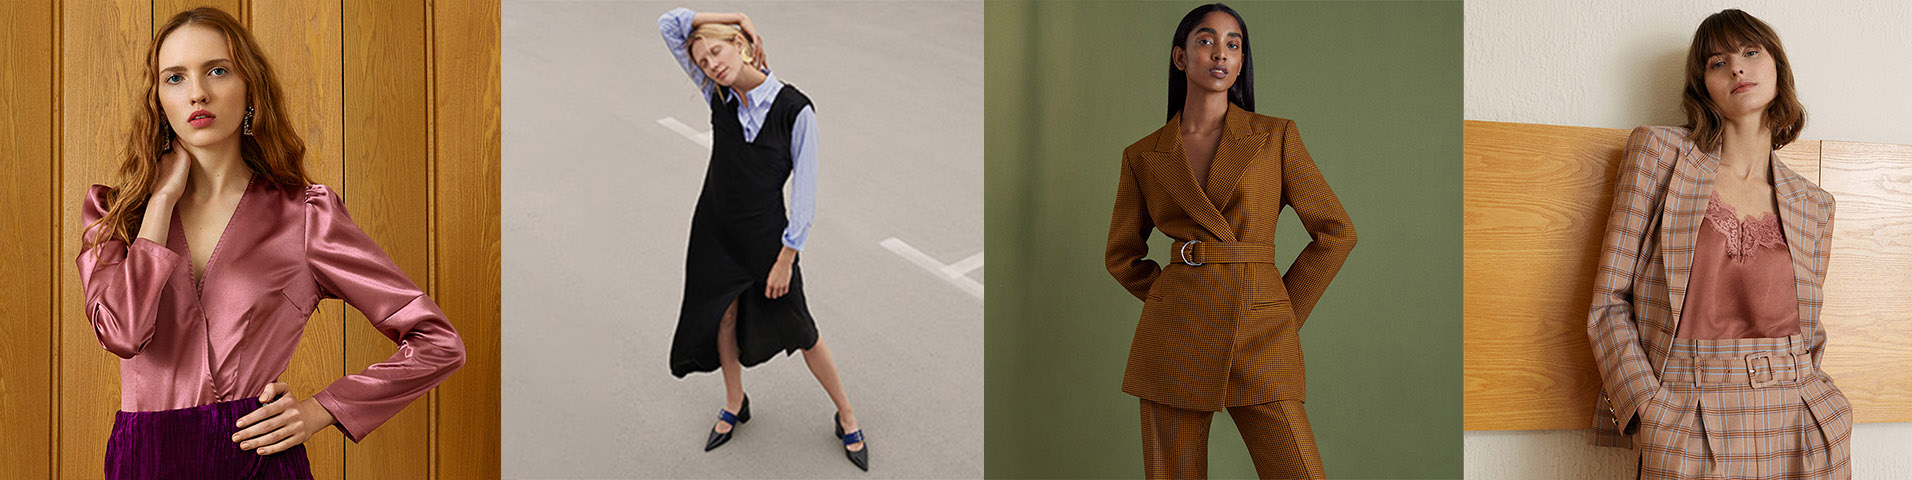 60/%! khujo Damen Sweatshirt GOYA Hellgrün Fashionista Trend Look SALE